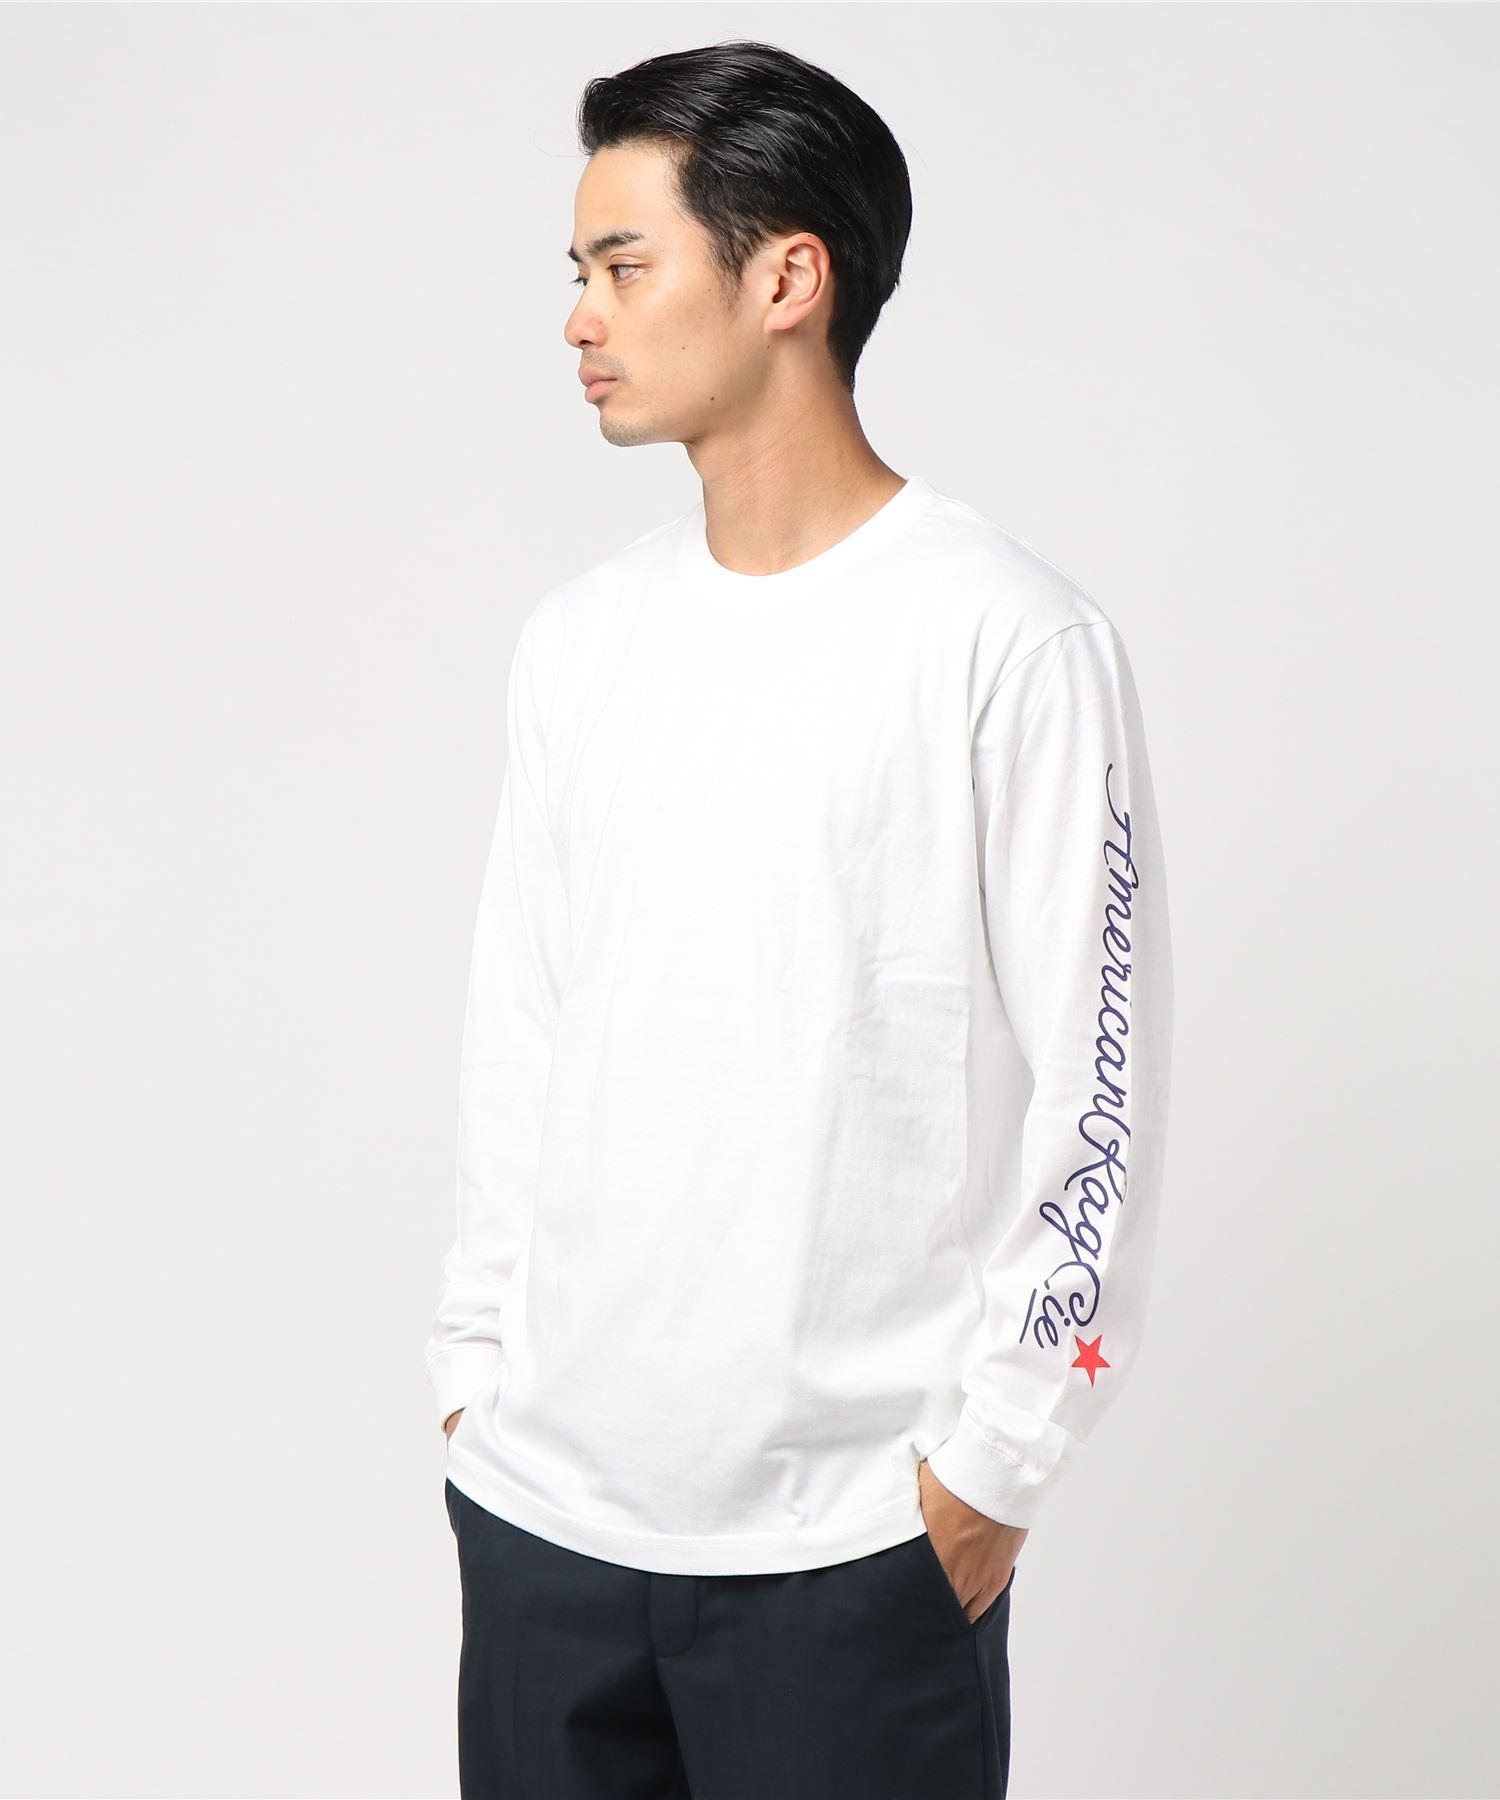 AMERICAN RAG CIE ARC Script Logo Print Longsleeve T Shirt/アメリカンラグシー ARCスクリプトロゴプリントロンT